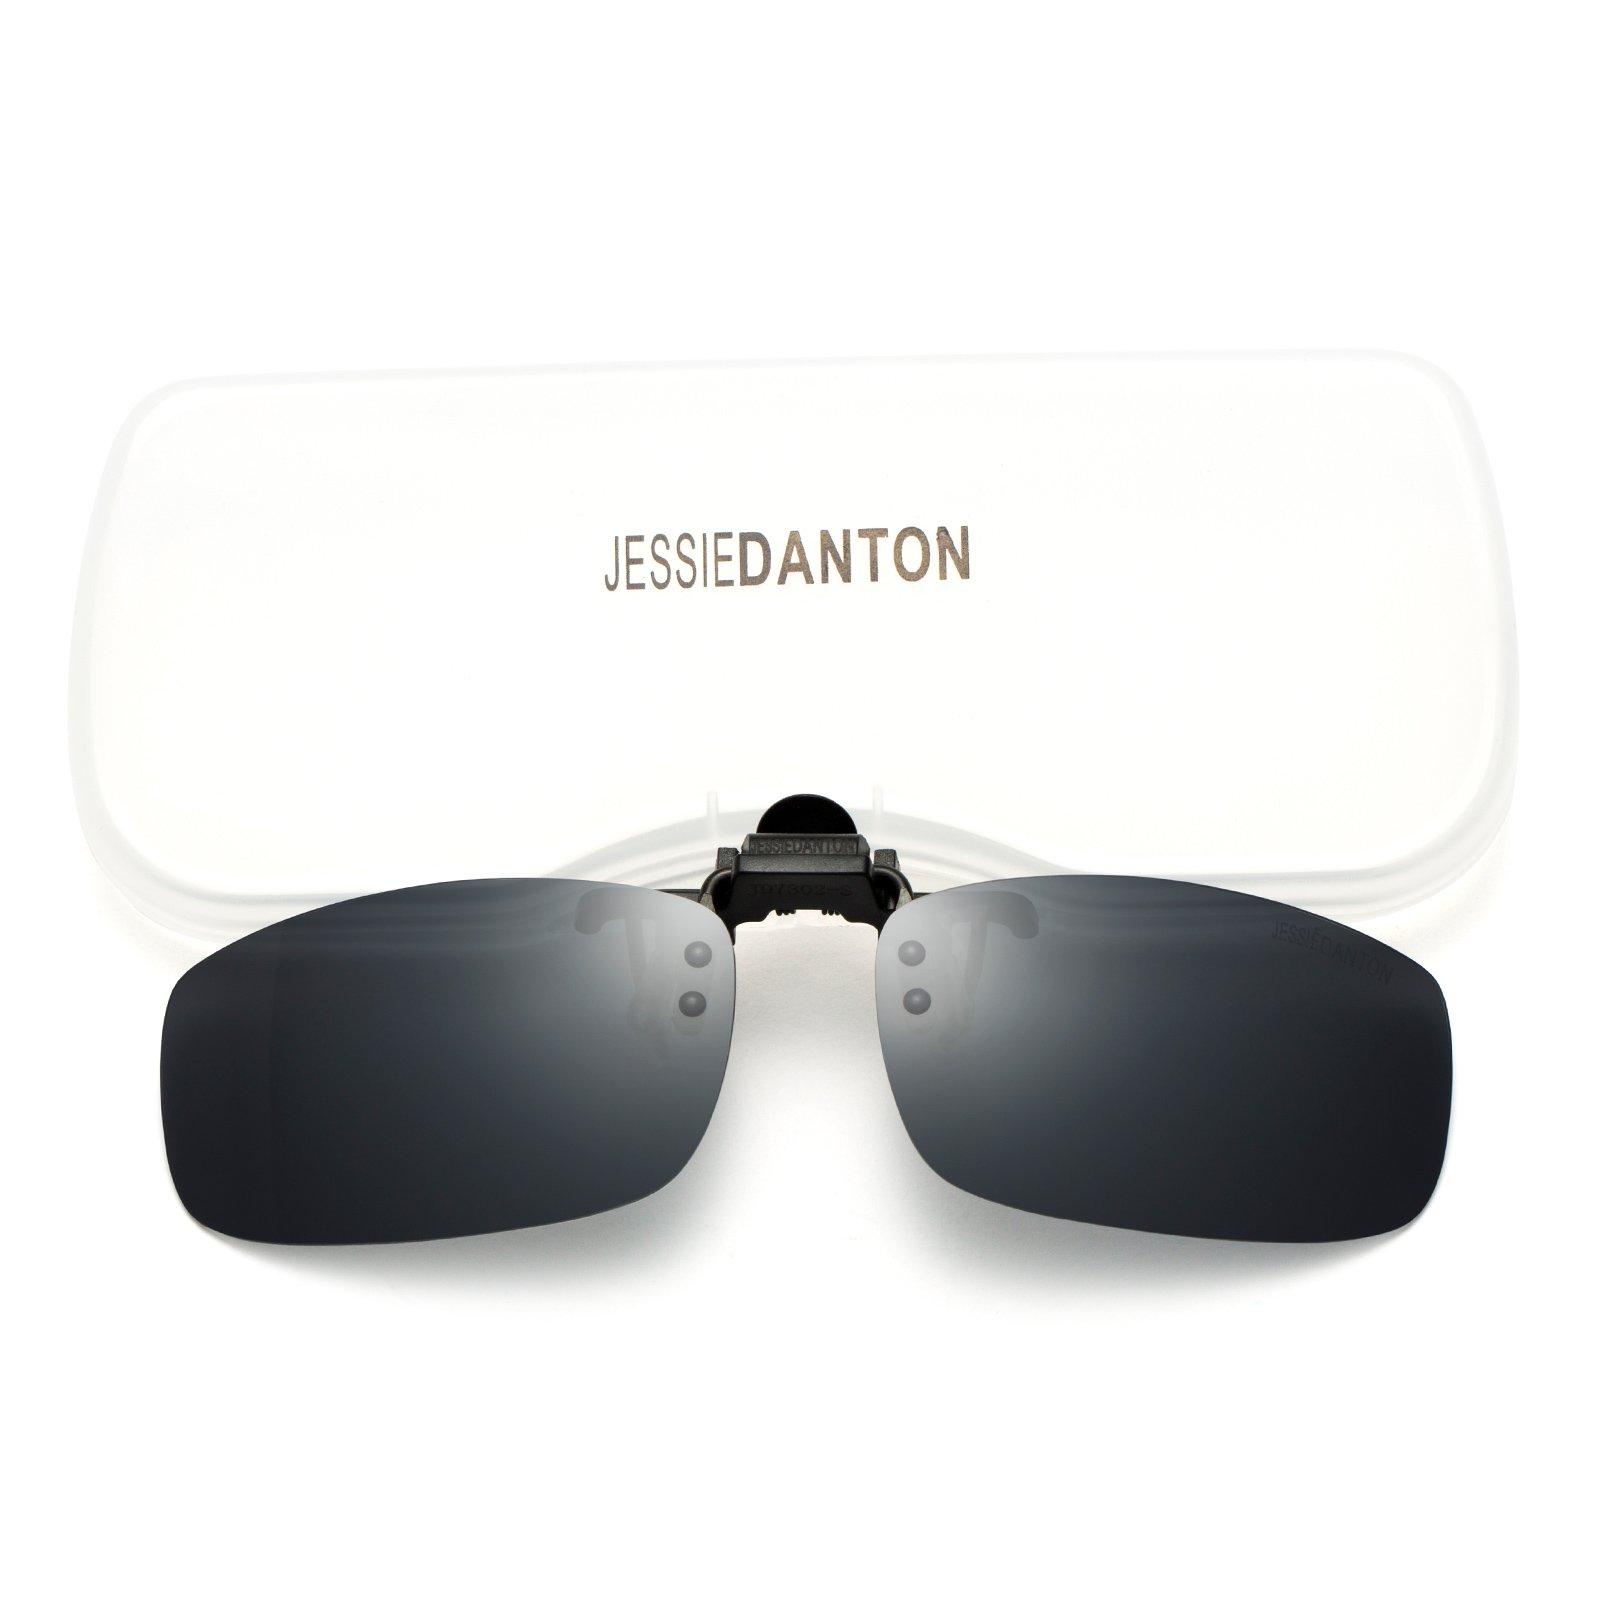 JESSIEDANTON Polarized Clip-on Flip Up Metal Clip Rimless Sunglasses for Eyeglasses, Lightweight, M Size, Black Lens by CAXMAN